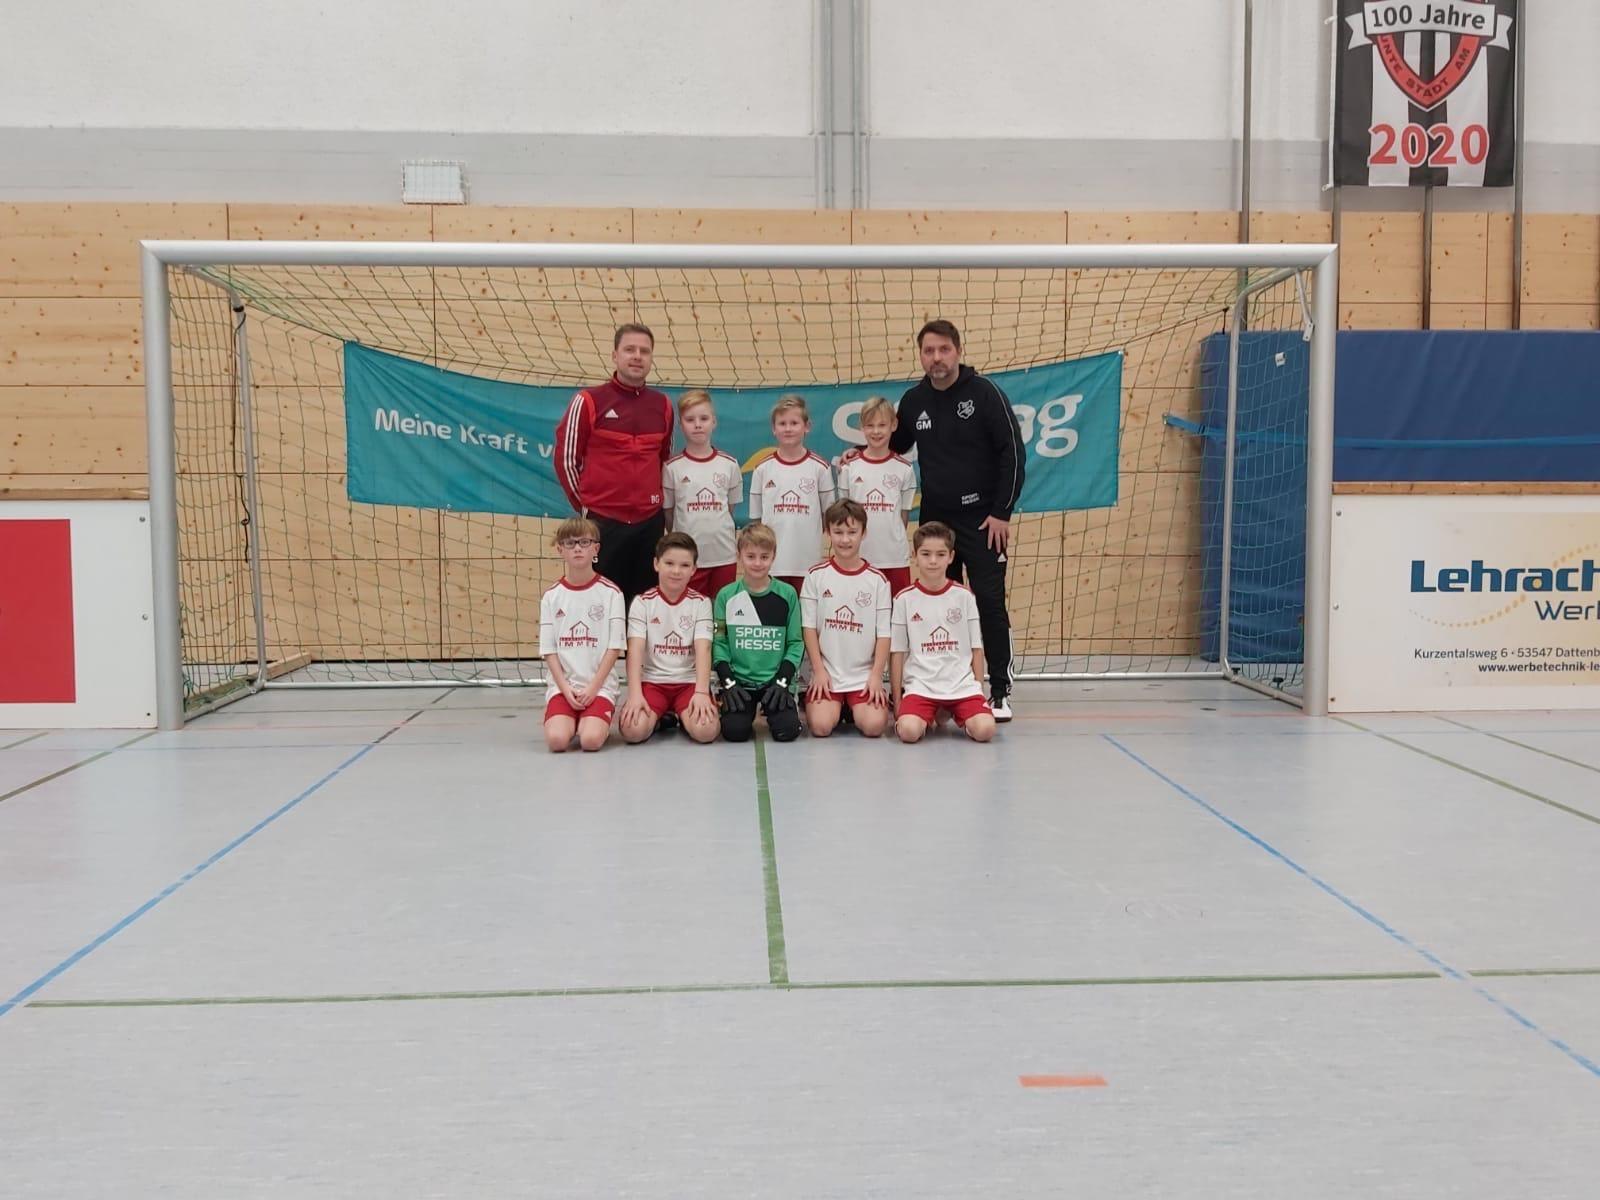 E-Junioren U10 - Spfr. Eisbachtal - Süwag Hallencup 2020